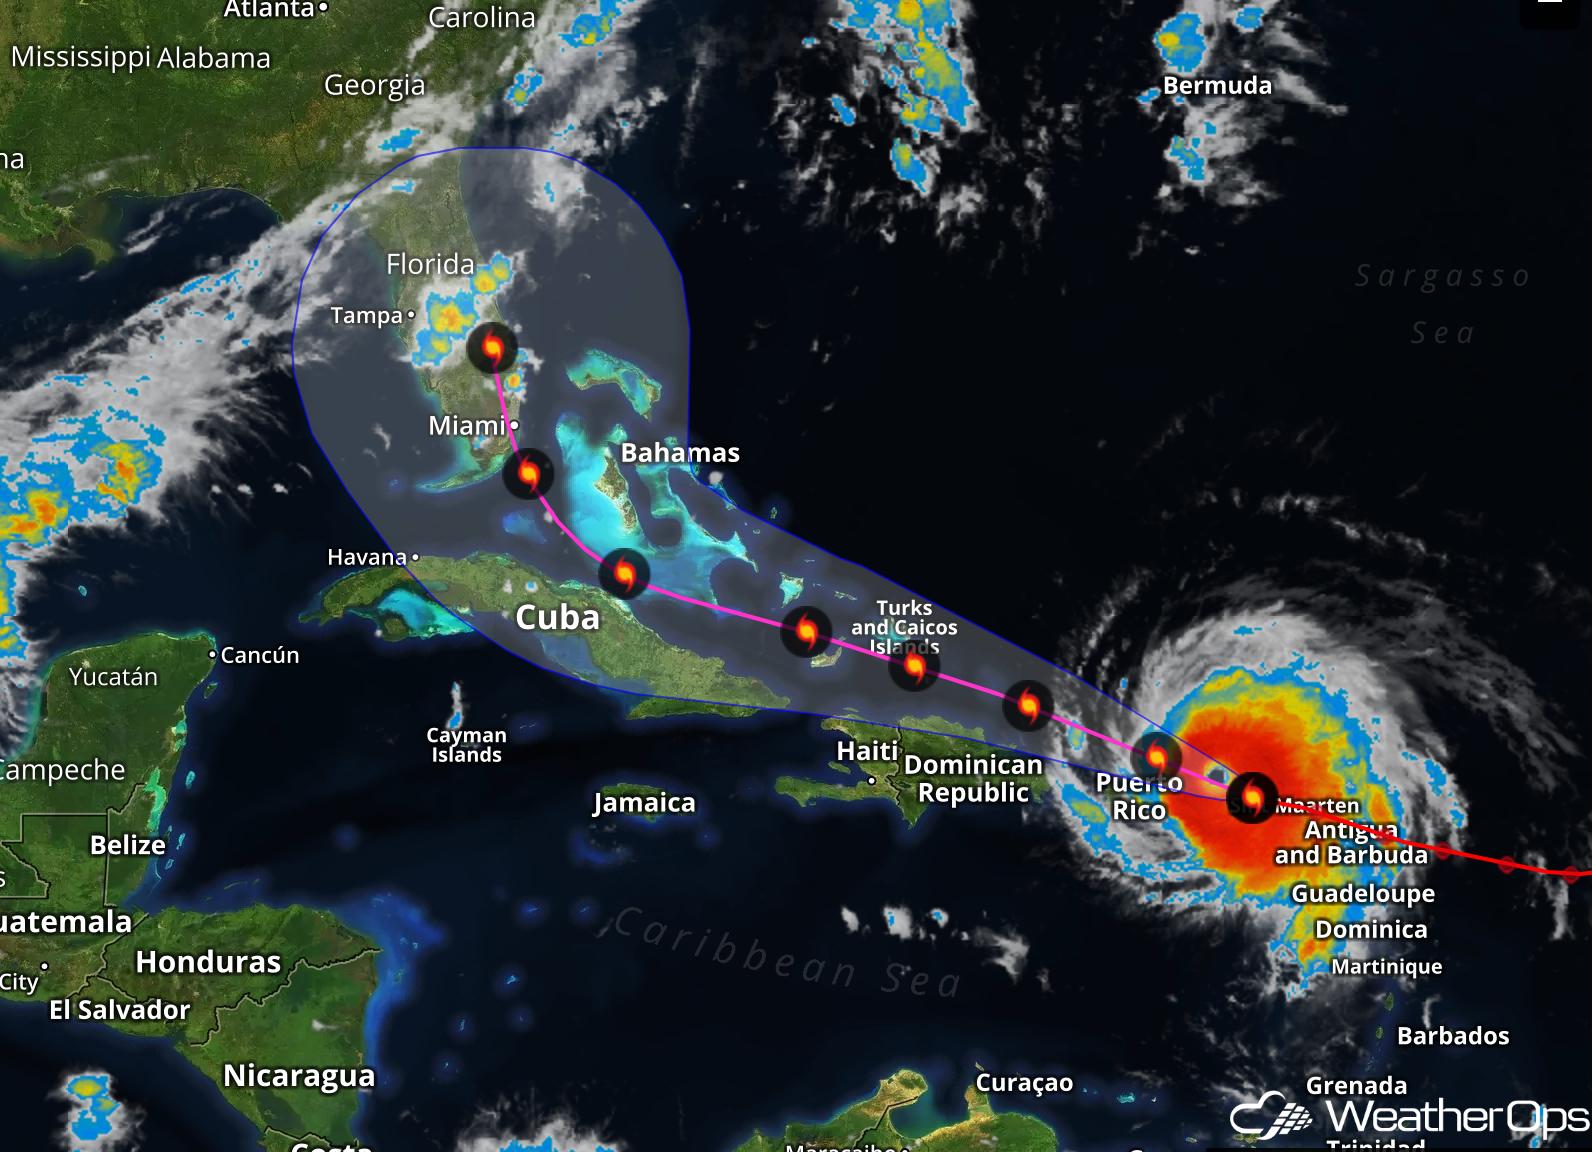 Hurricane Irma Aims for Florida -Sept 6